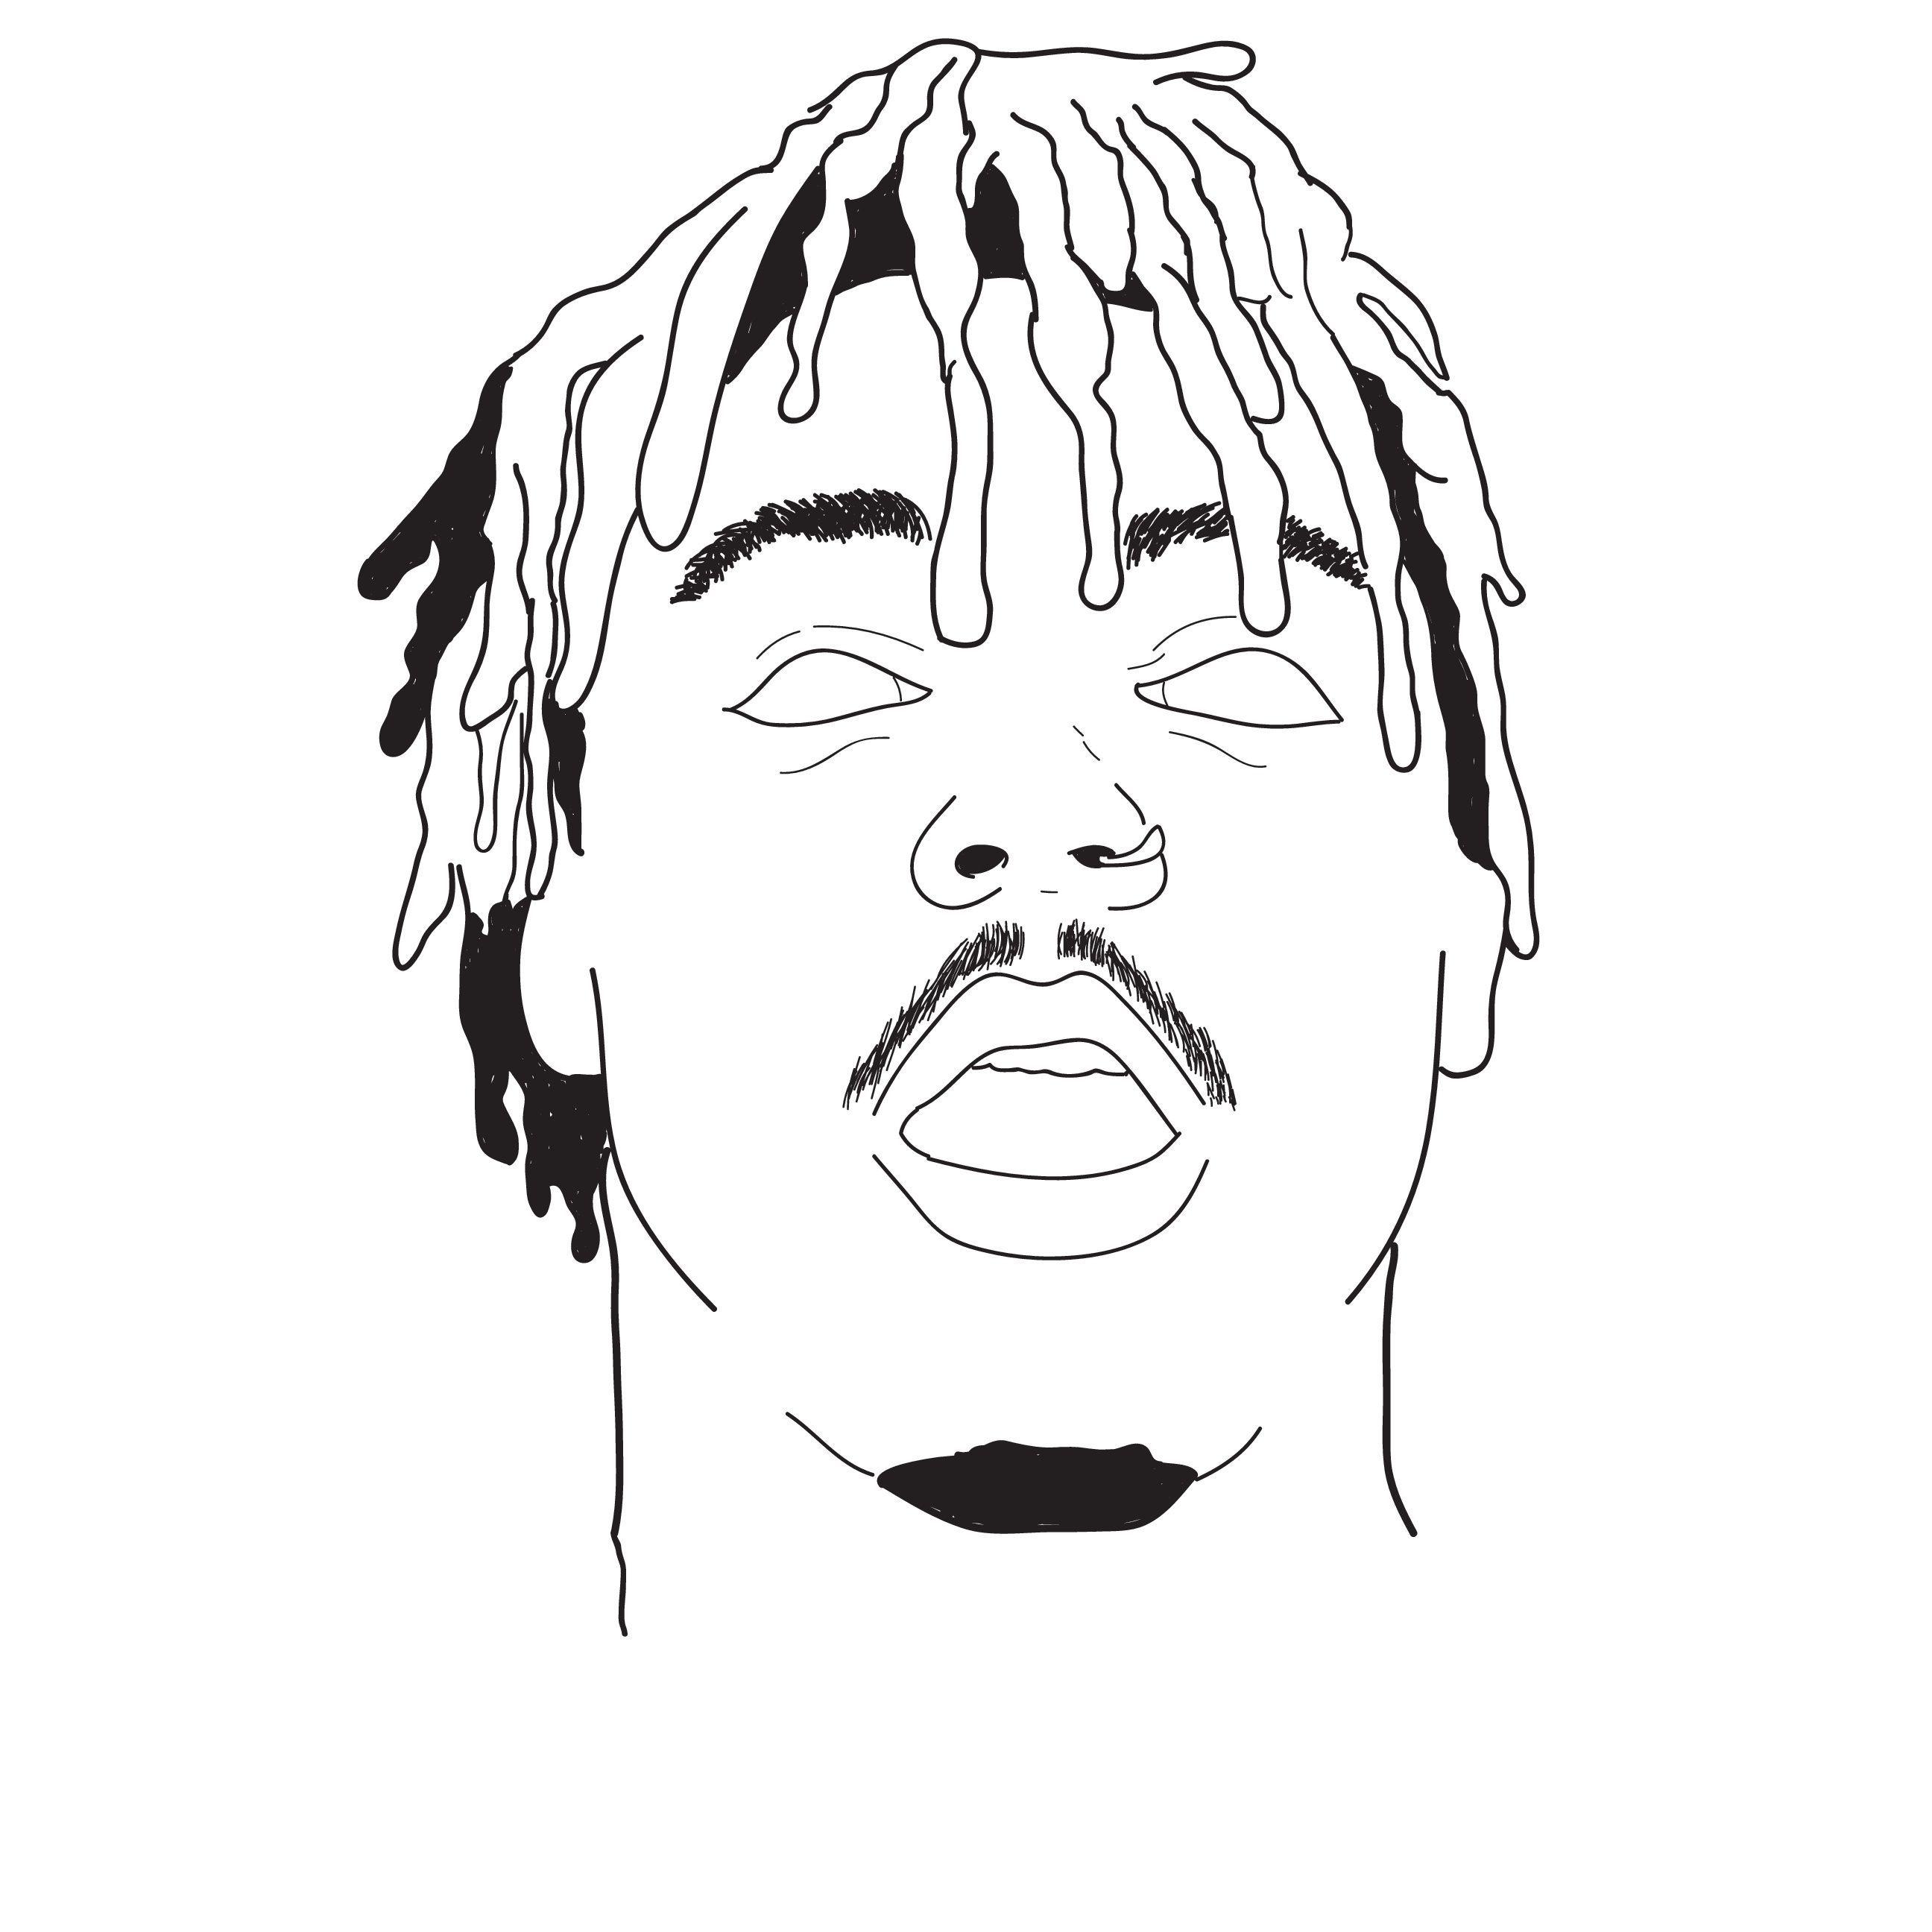 Juice Wrld Juicewrld Rapper Art Trippy Painting Rappers